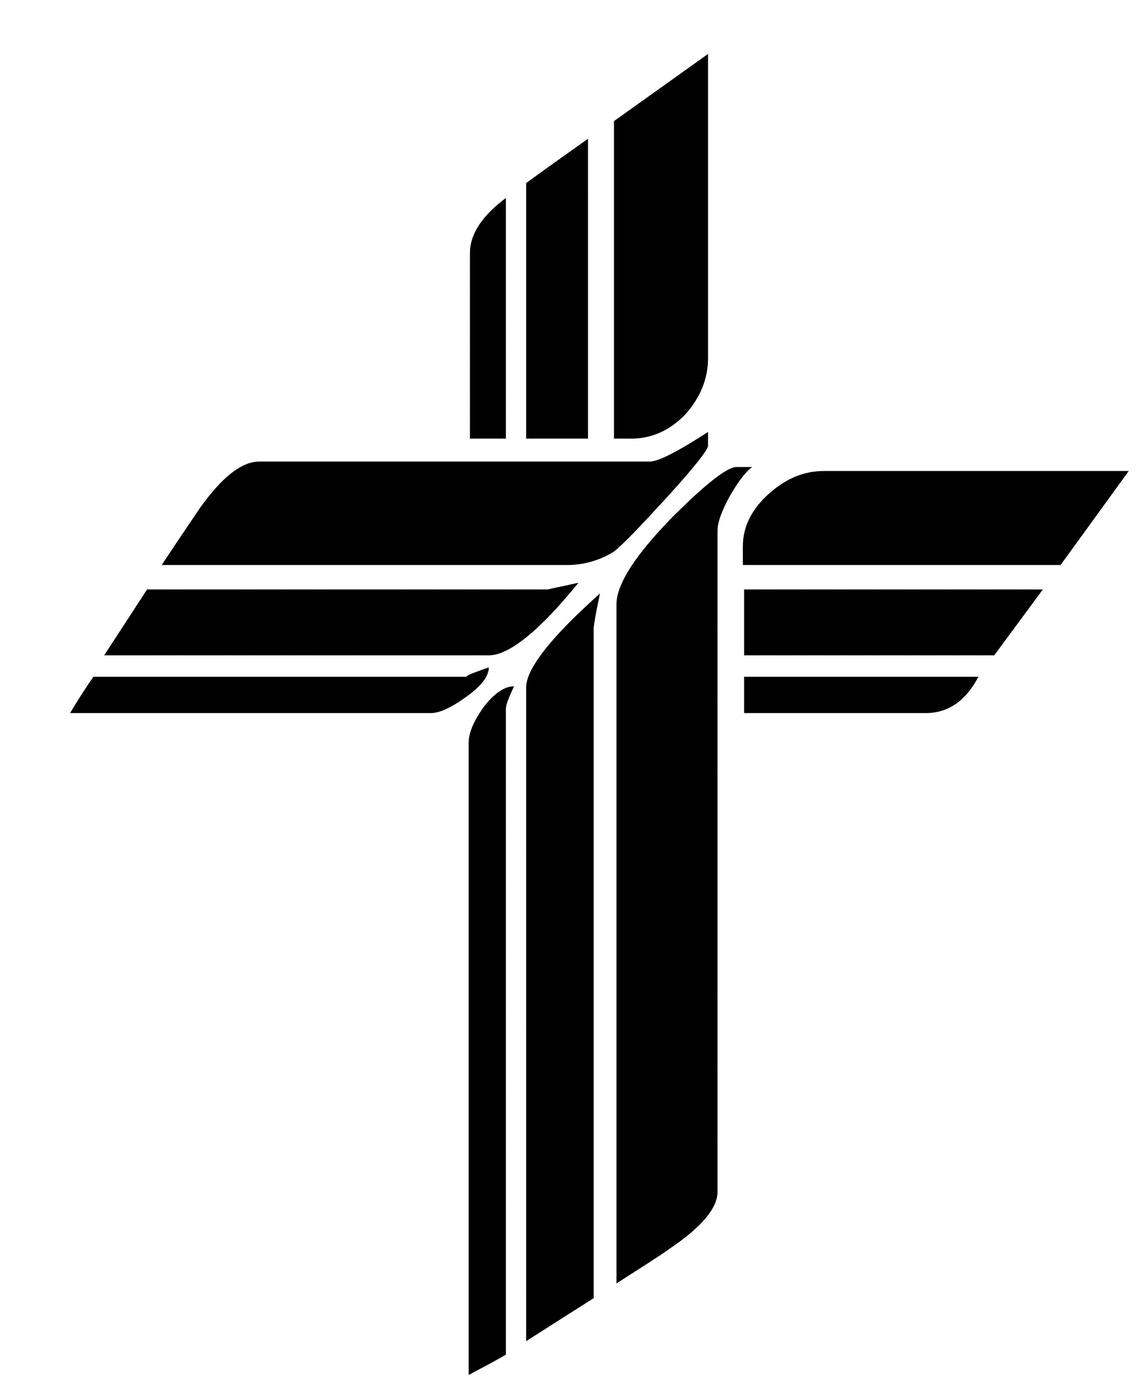 Catholic clipart lutheran church, Catholic lutheran church.